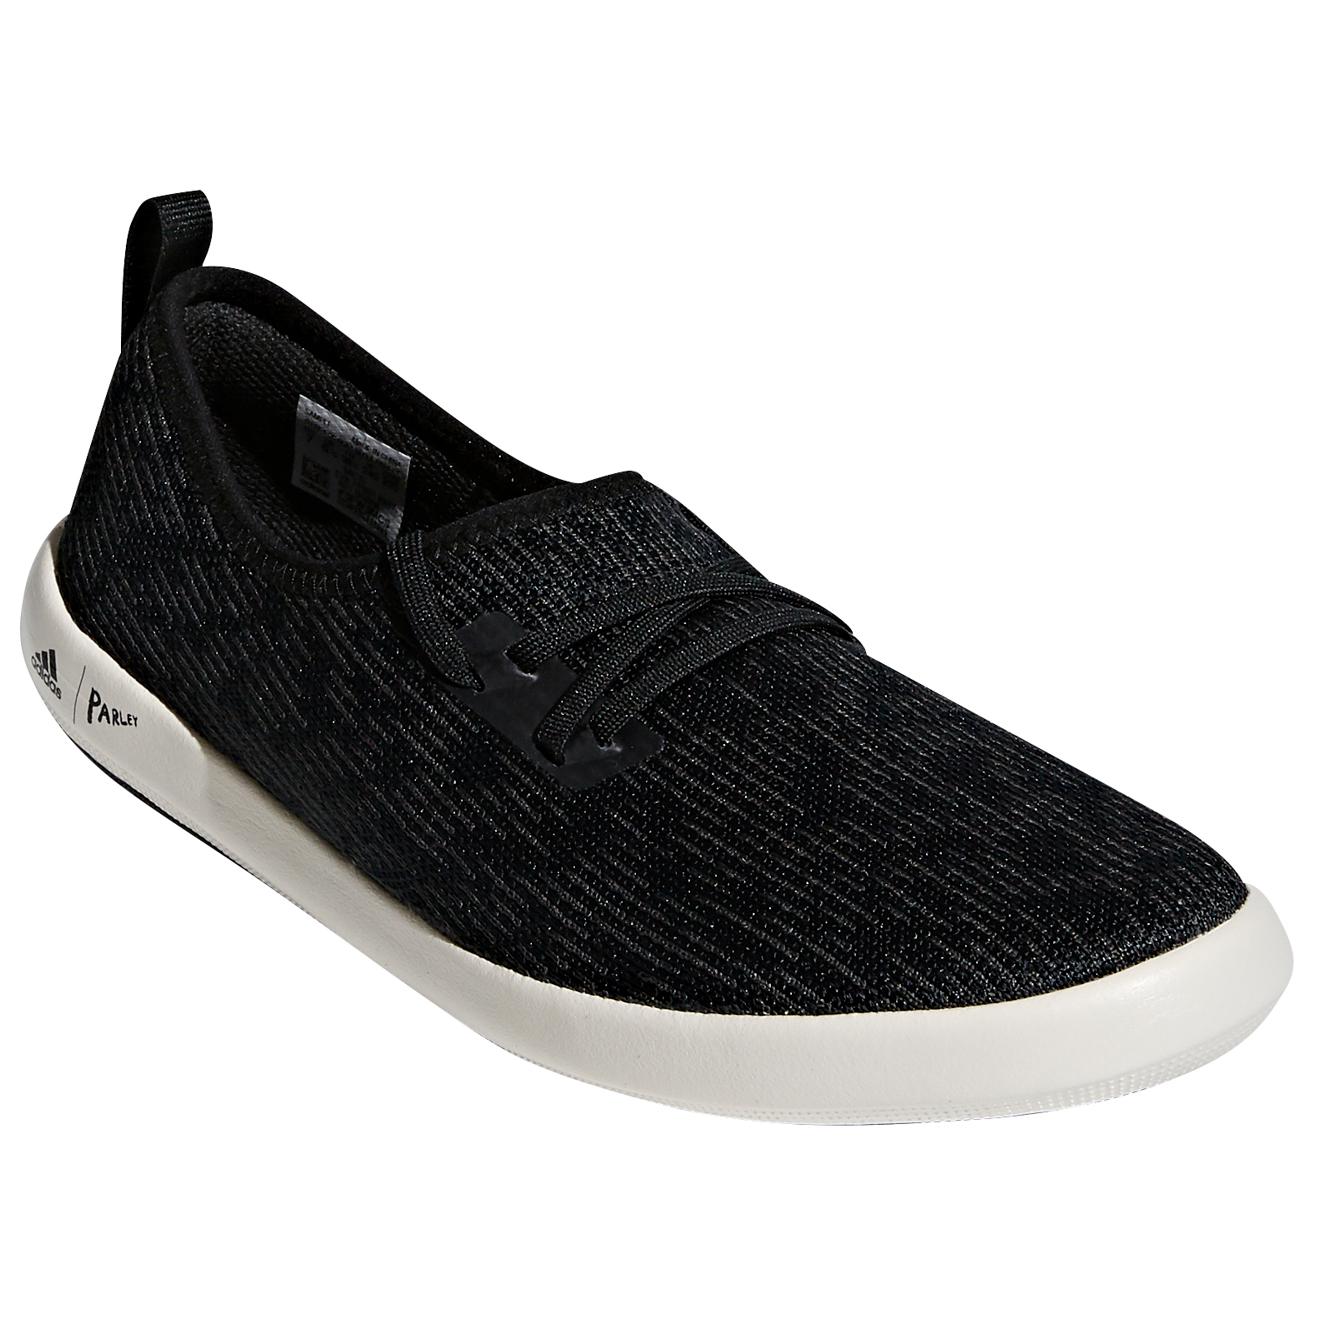 Adidas Terrex CC Boat Sleek Parley